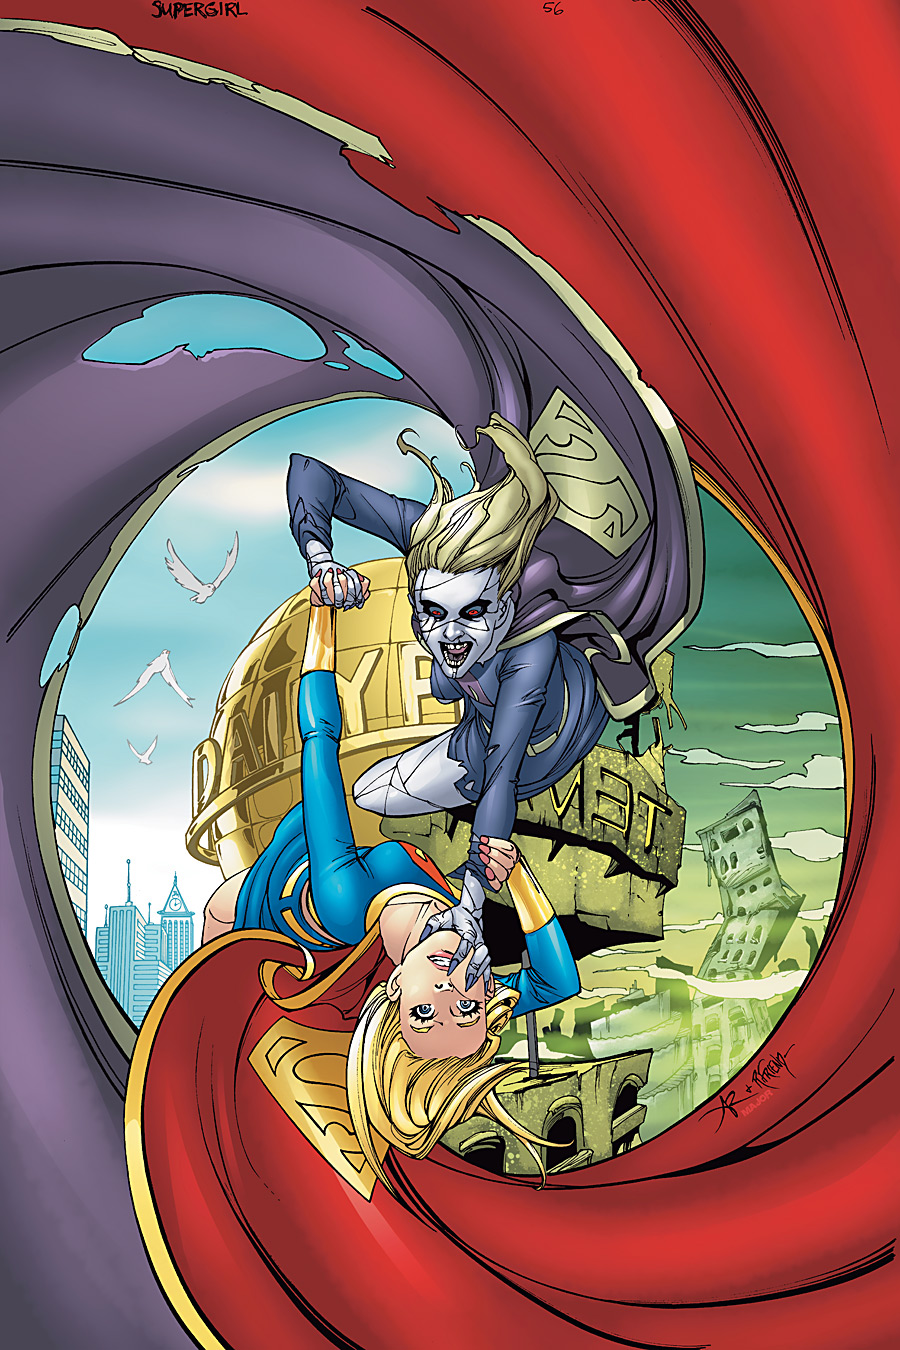 Supergirl Vol 5 56 Textless.jpg